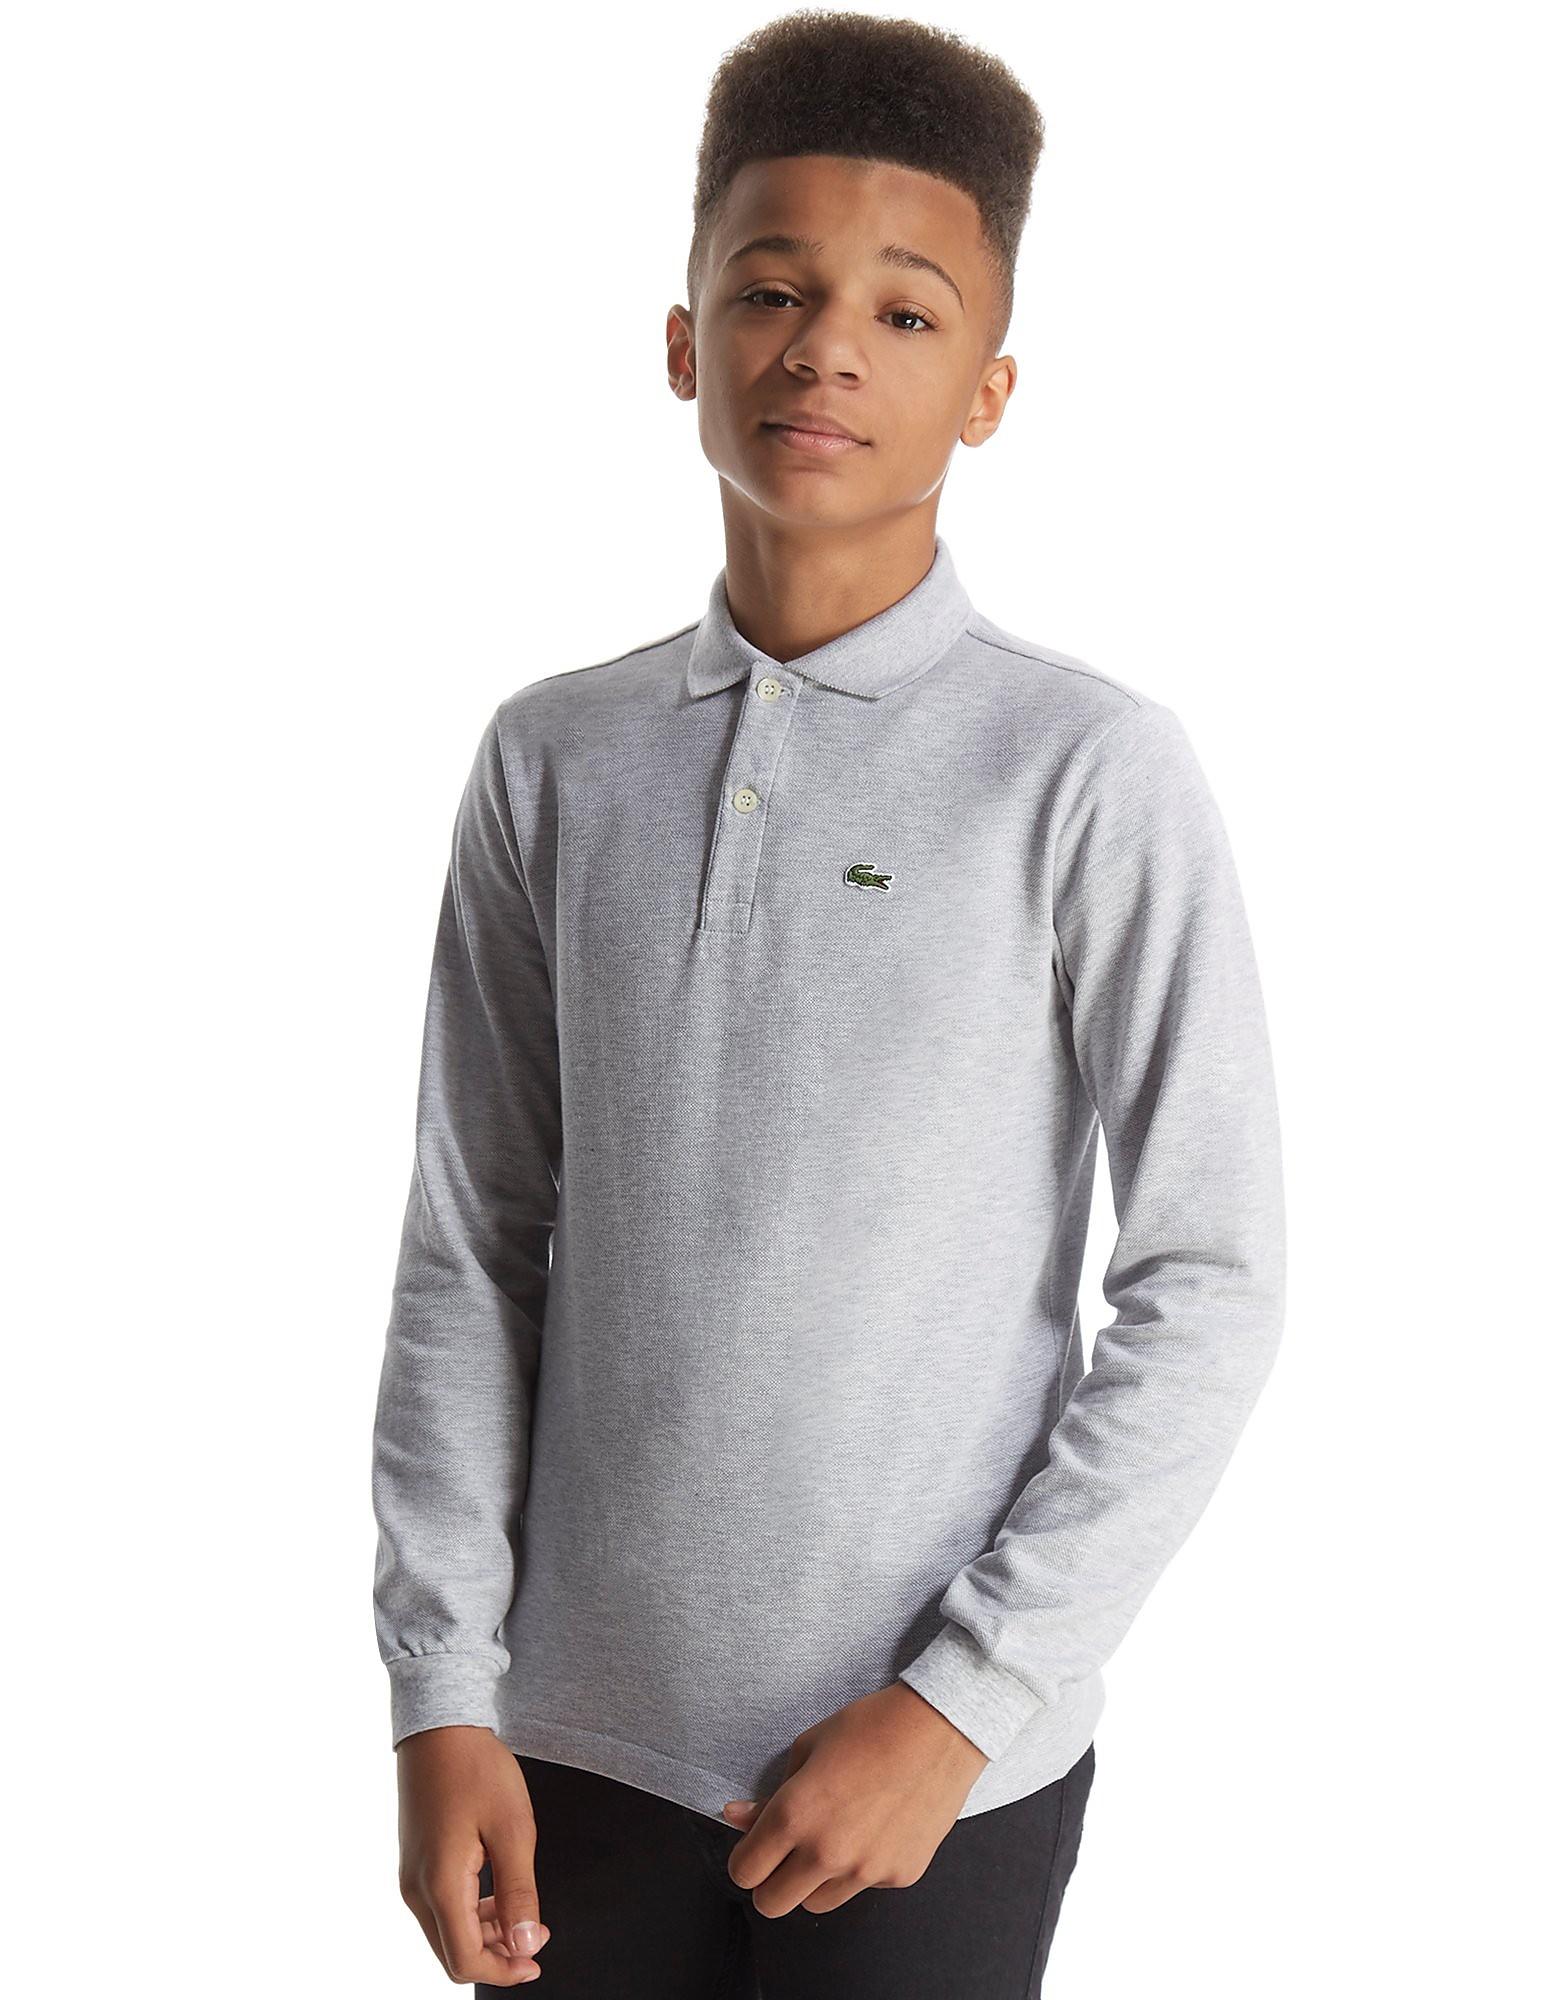 Lacoste Longsleeve Polo Shirt Junior